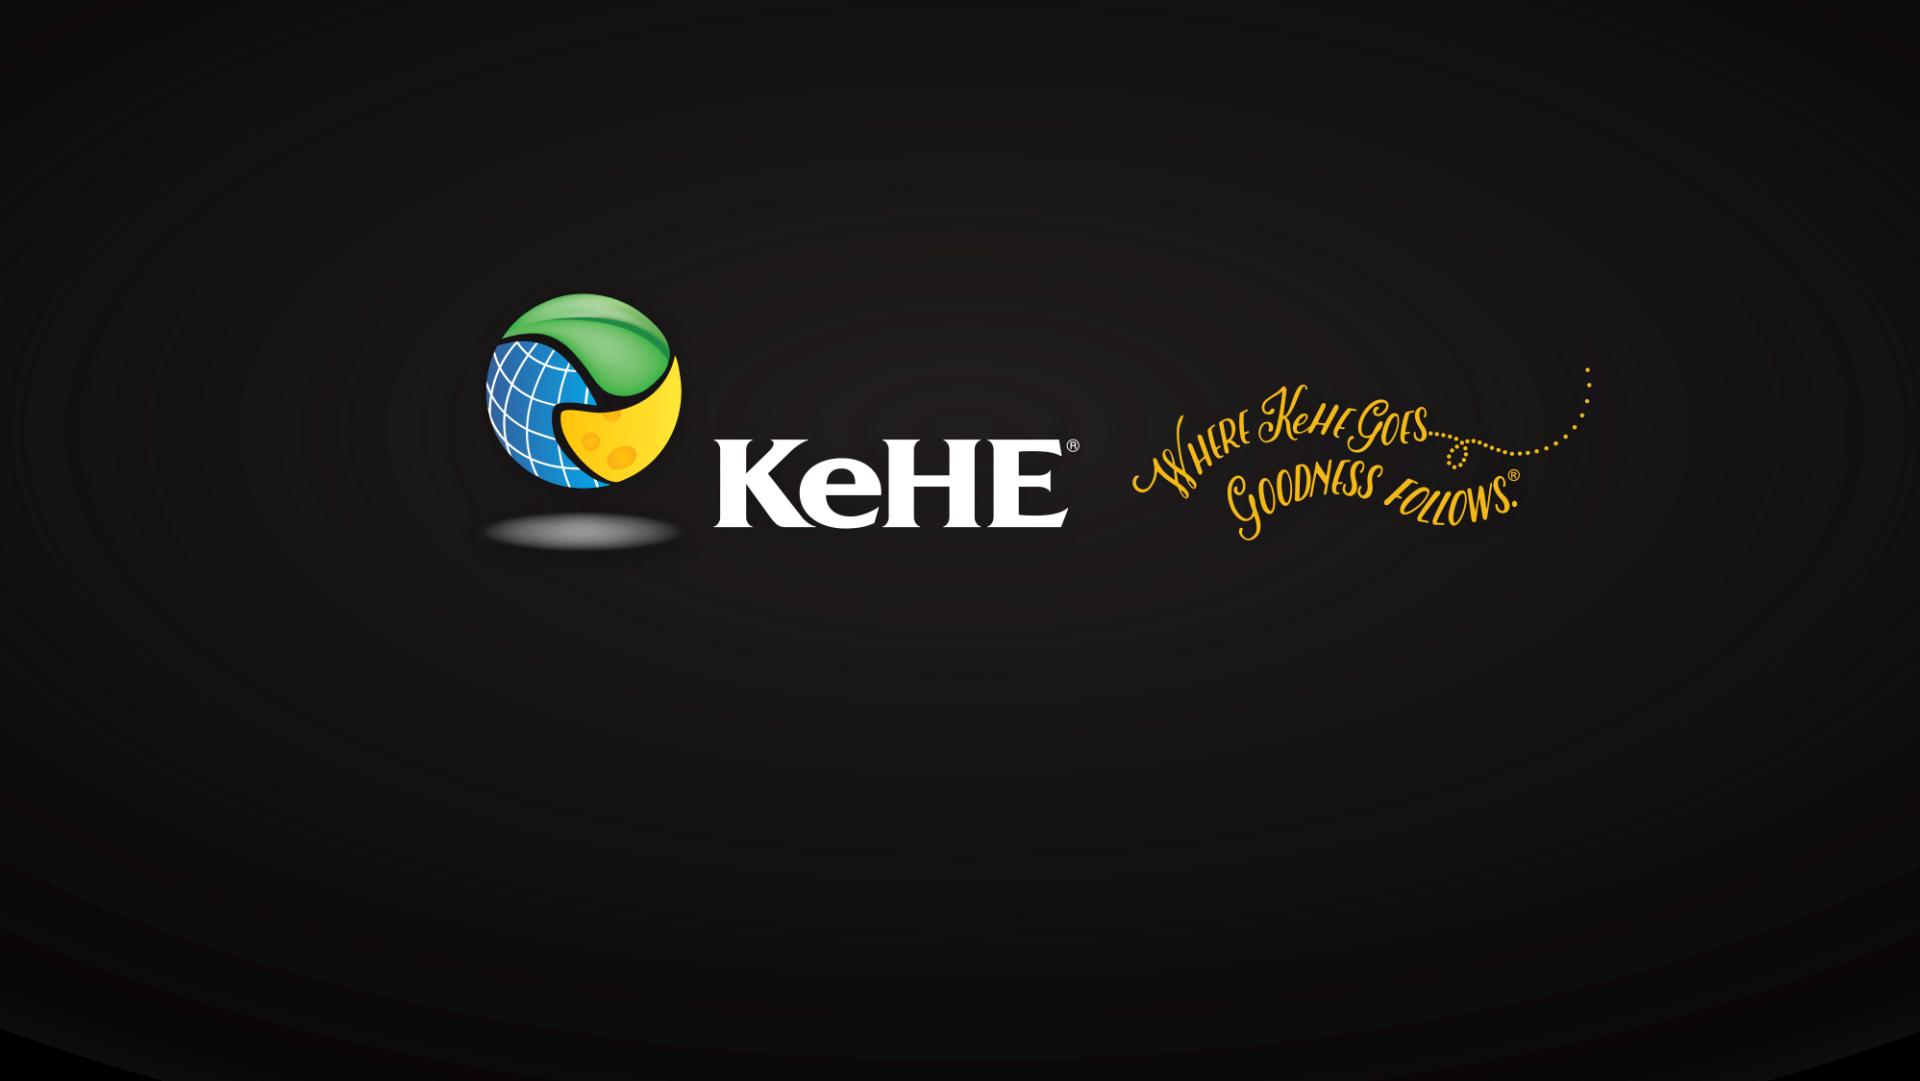 KeHE Distributors, LLC – Where KeHE Goes… Goodness Follows®